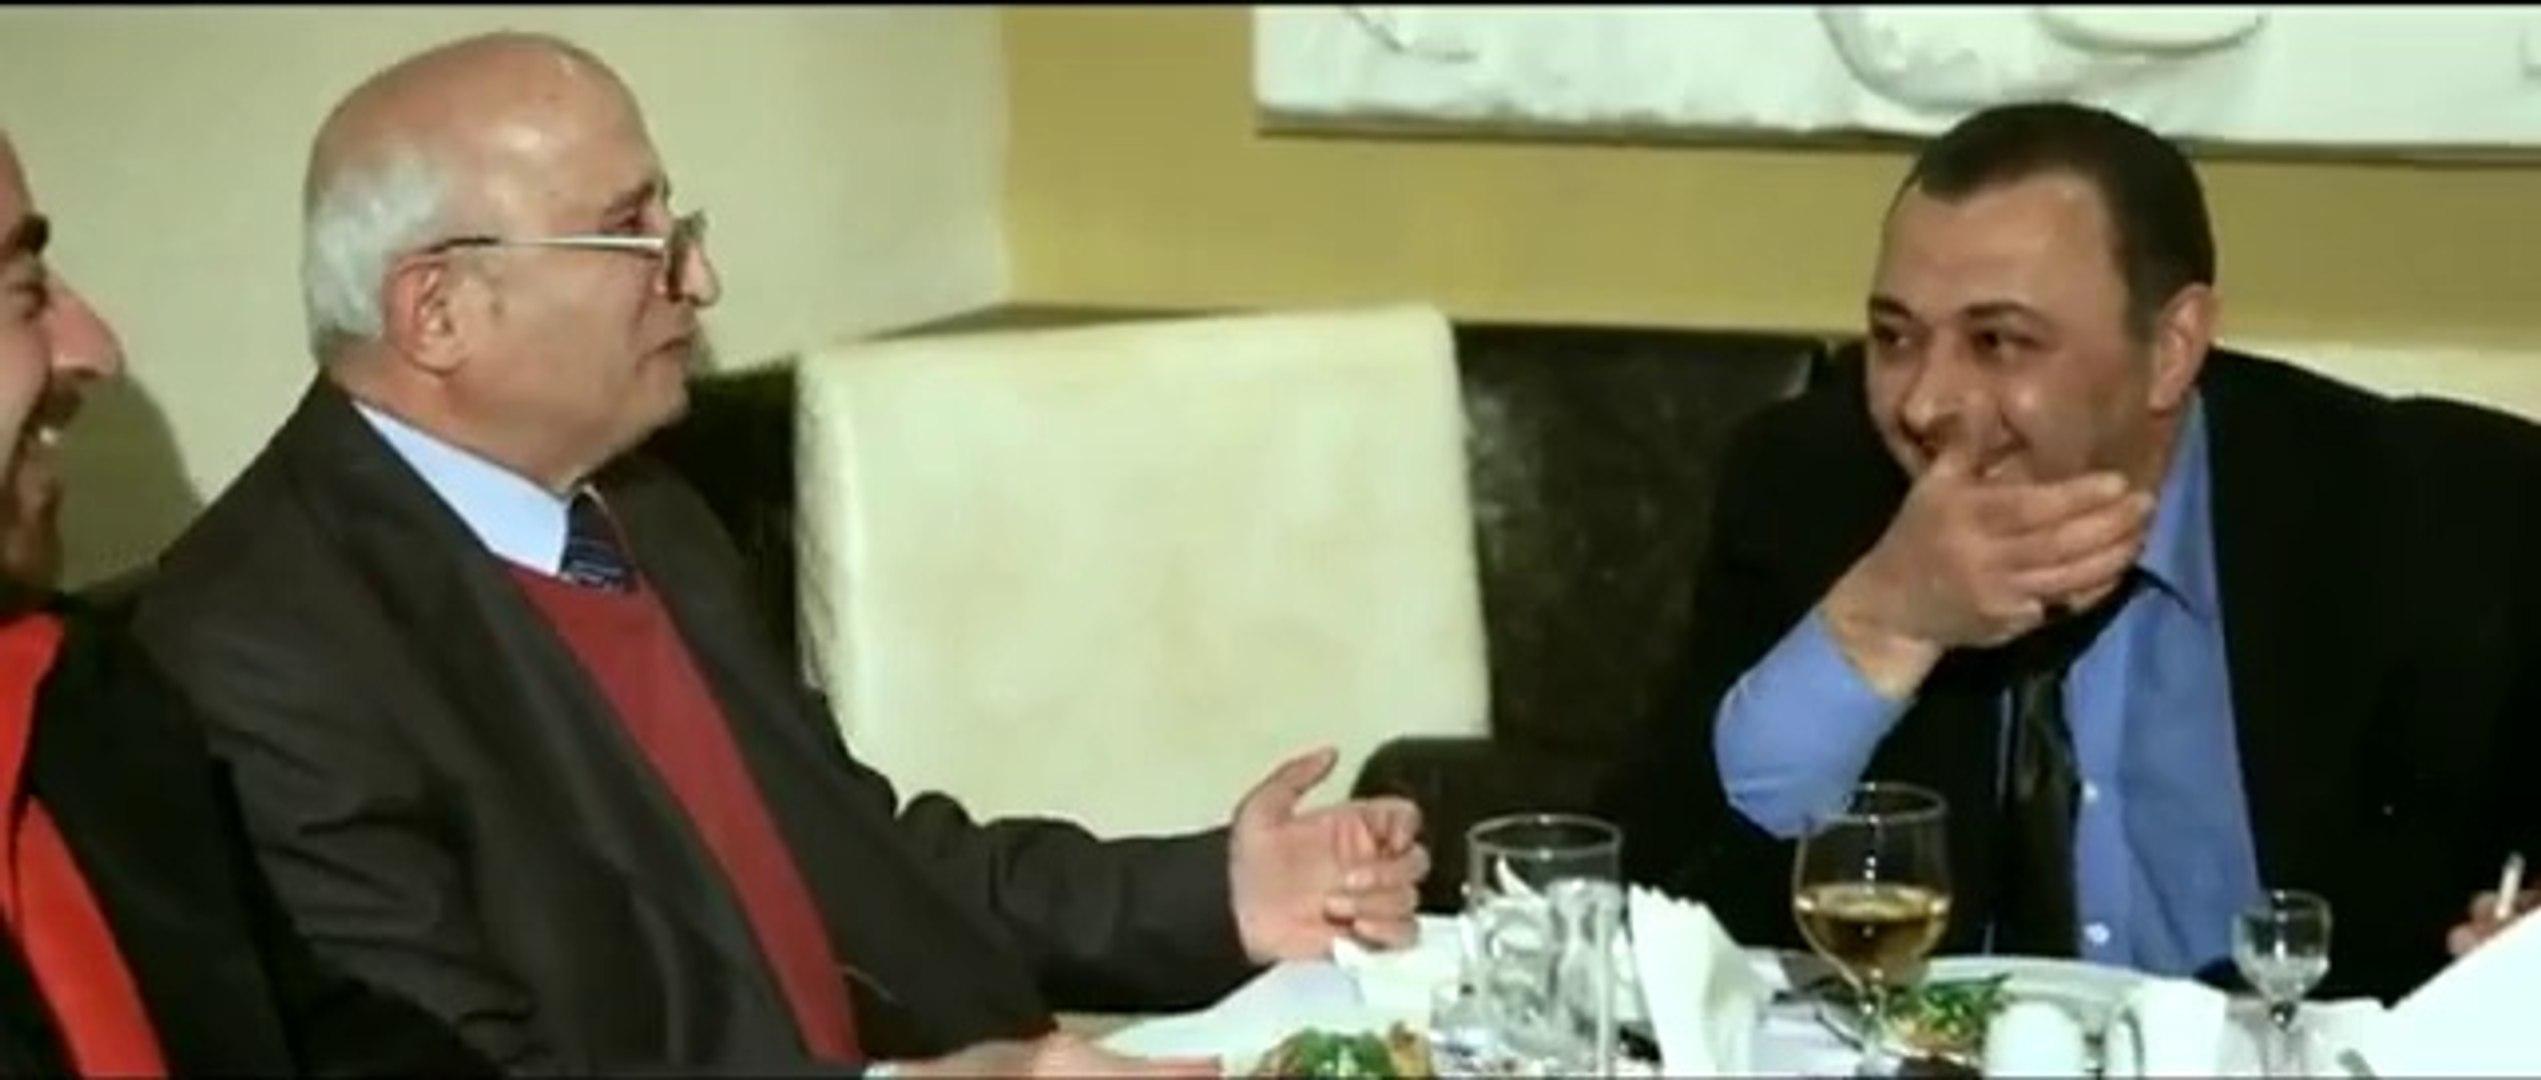 Смотреть онлайн армянский сериал Xaghic durs_25